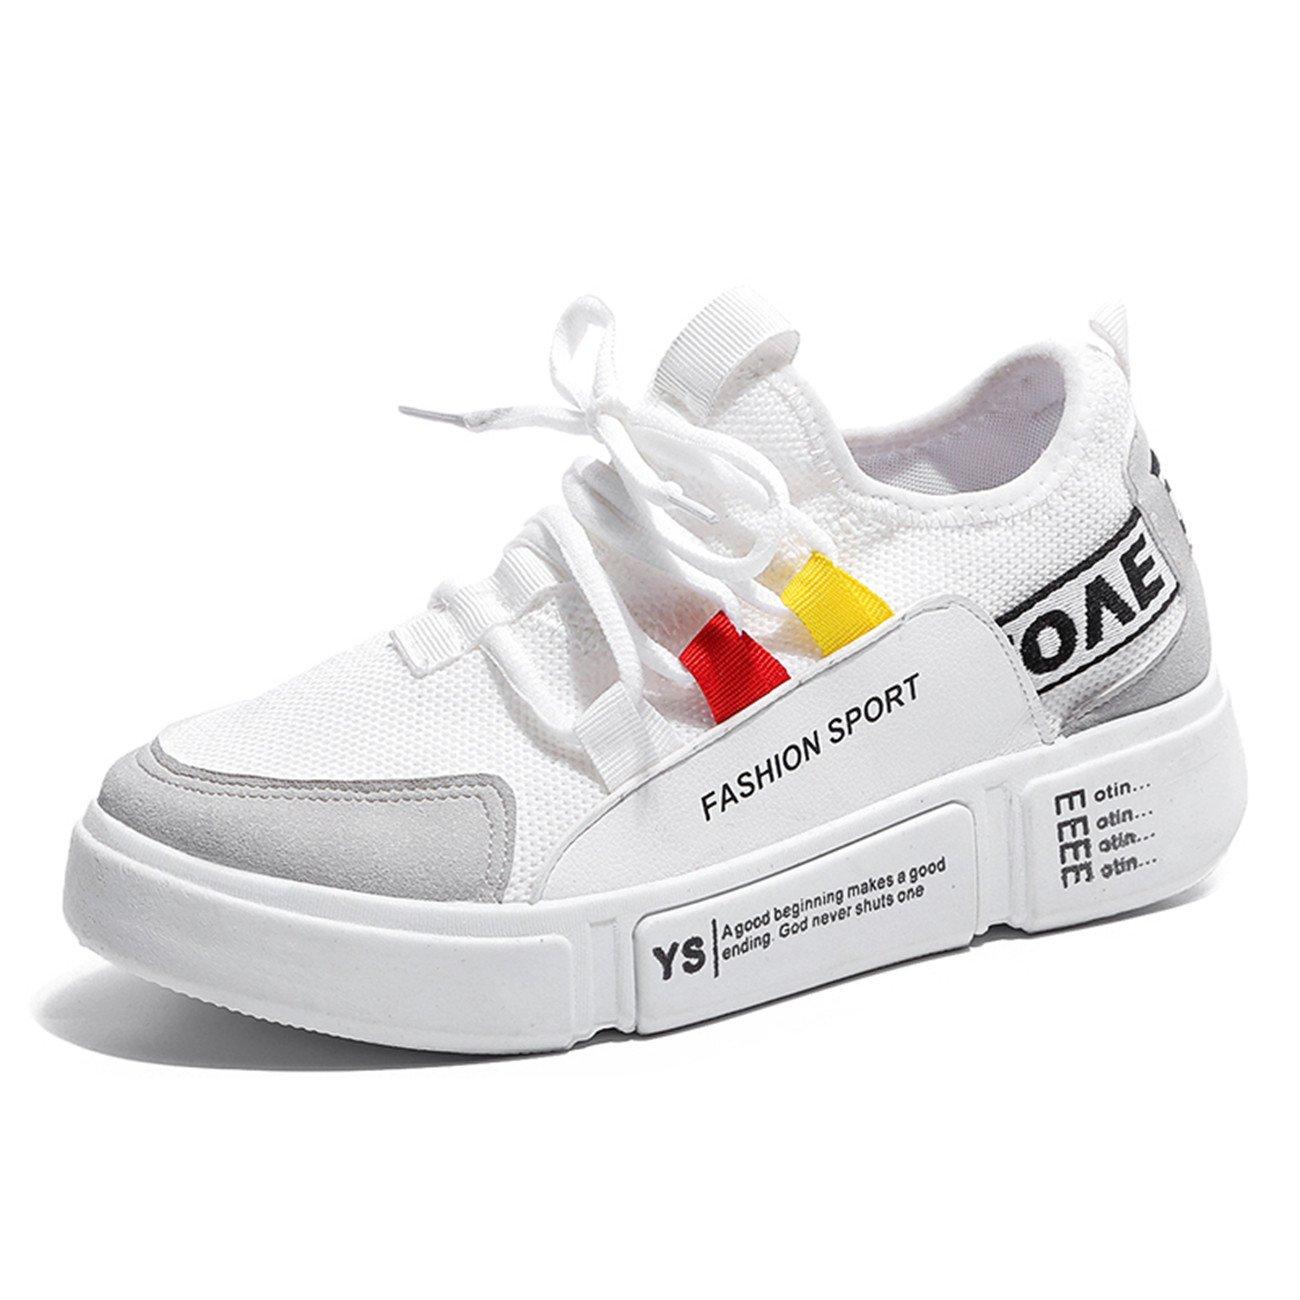 LSGEGO Women's Casual Sneaker Running Shoes Travel Walking Outdoor Fashion Street Tide Shoes